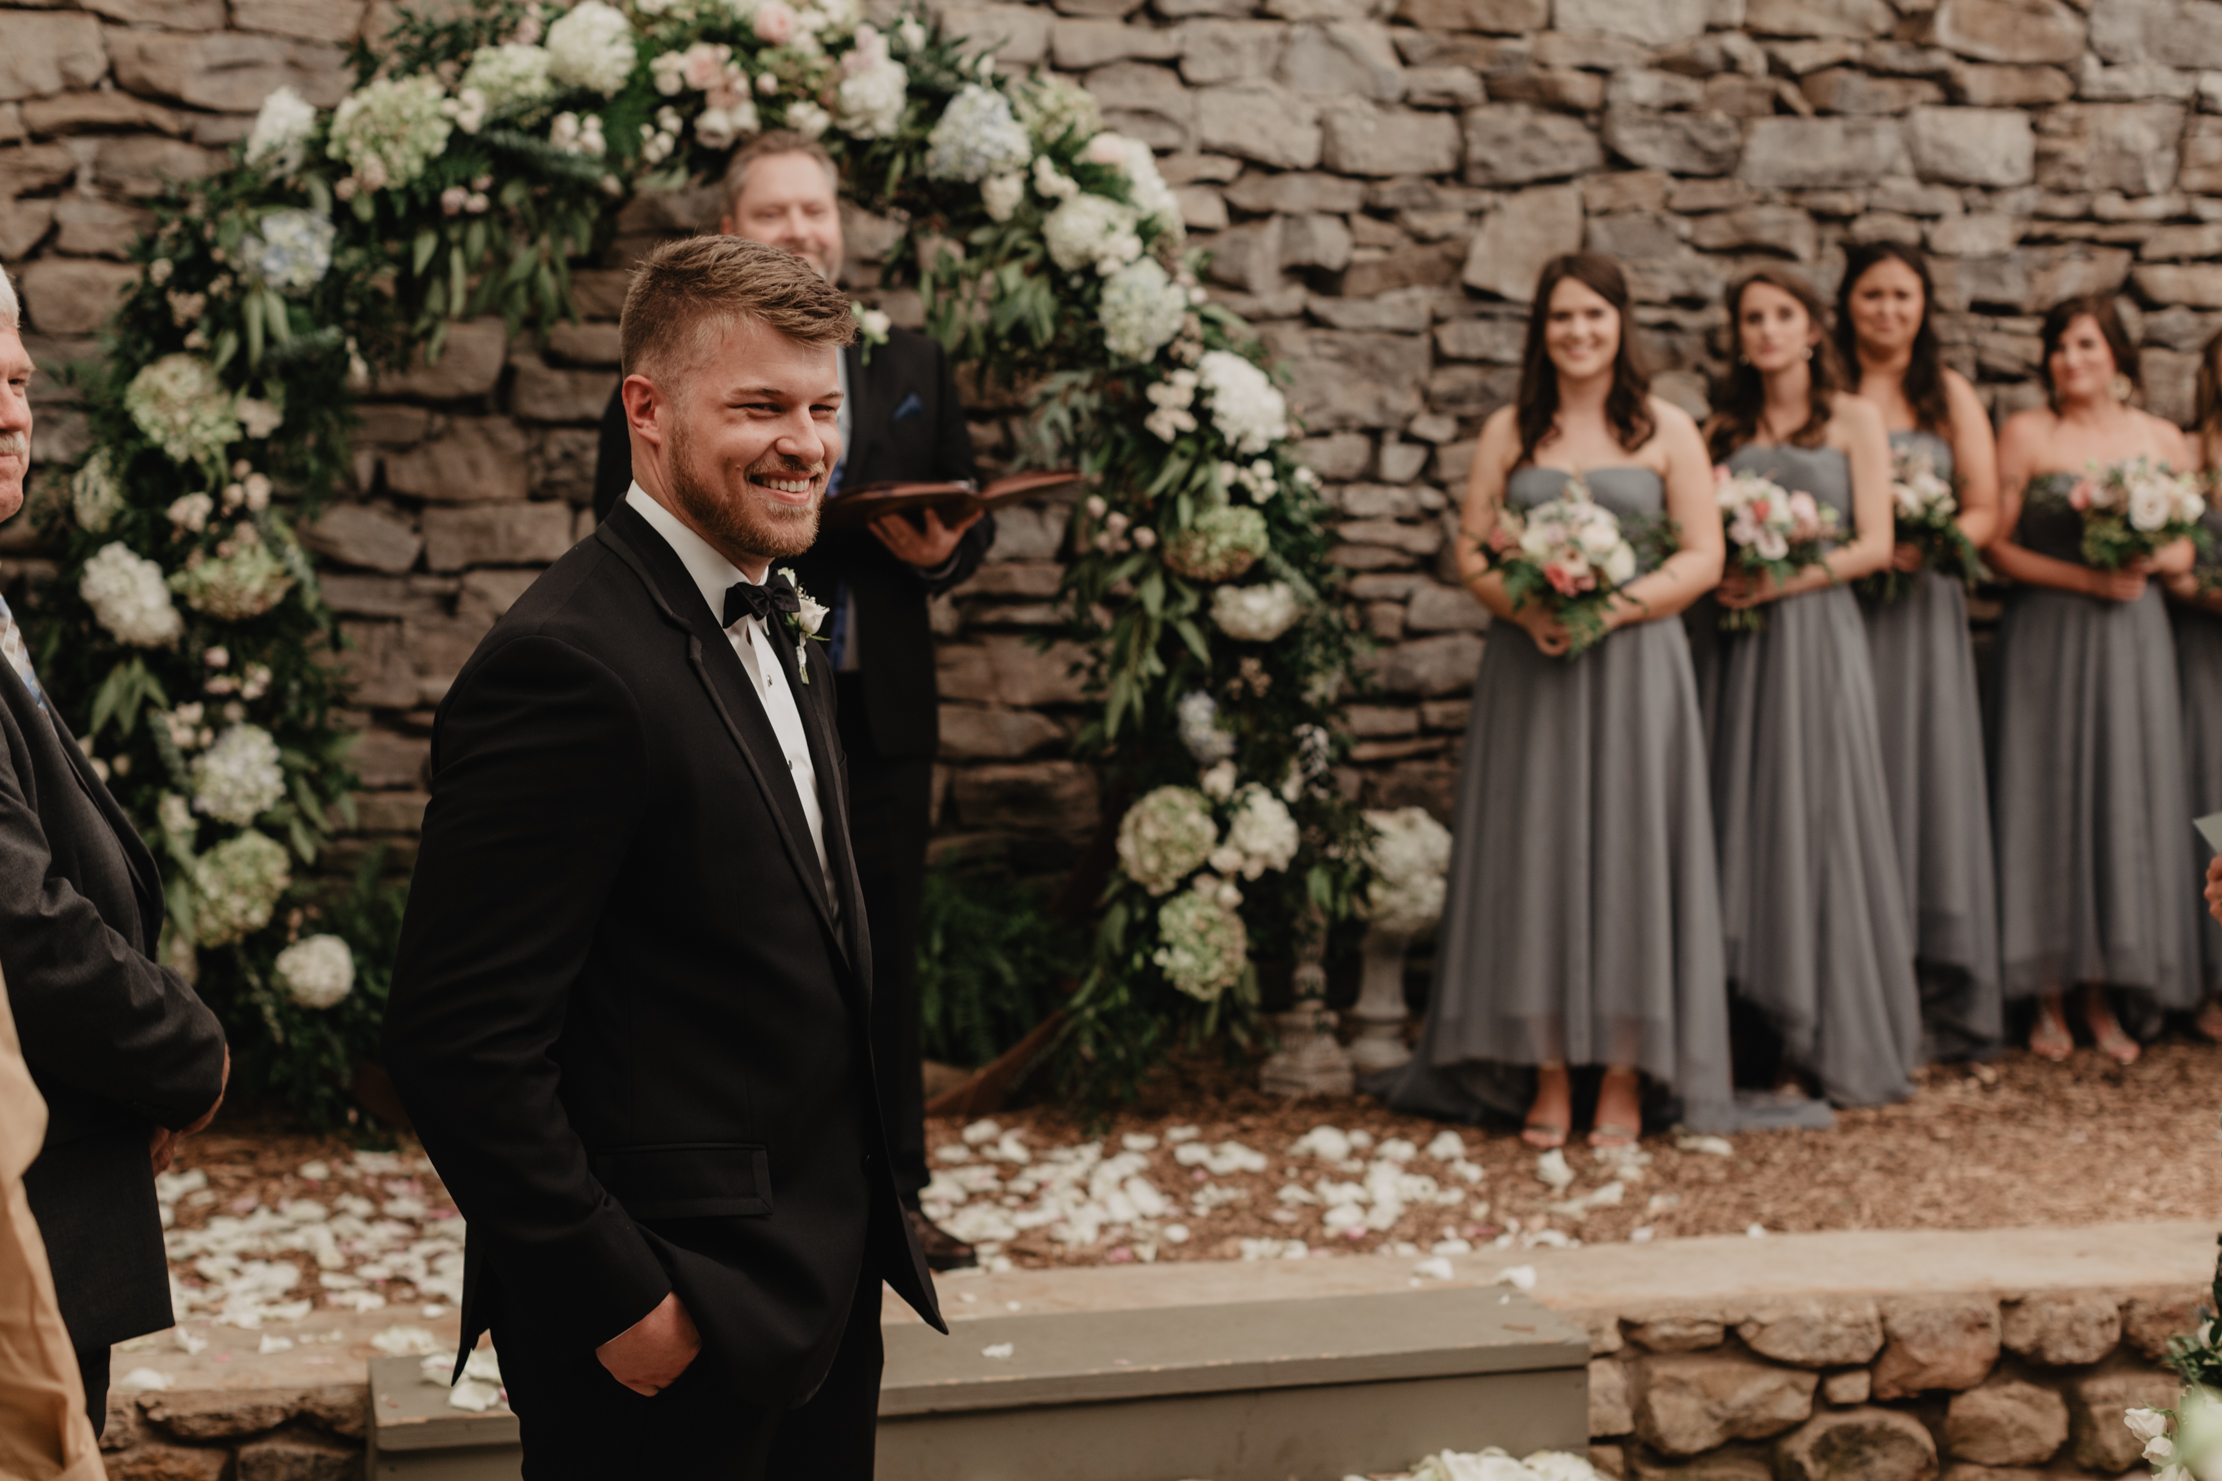 Wedding Venues | Knoxville Botanical Garden